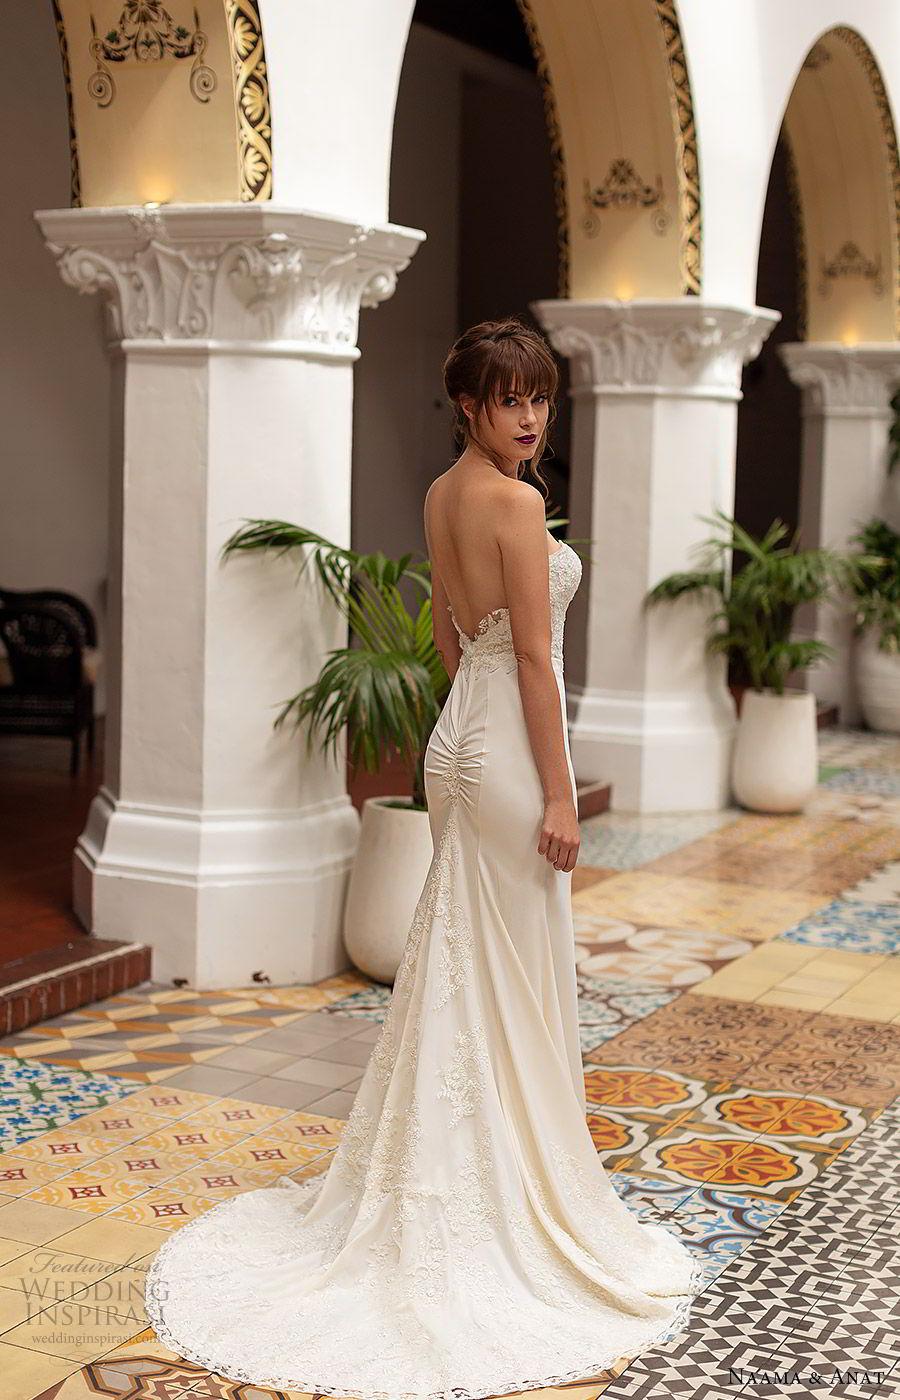 naama anat 2019 bridal strapless sweetheart embellished bodice sheath wedding dress  low back chapel train elegant modern (4) bv